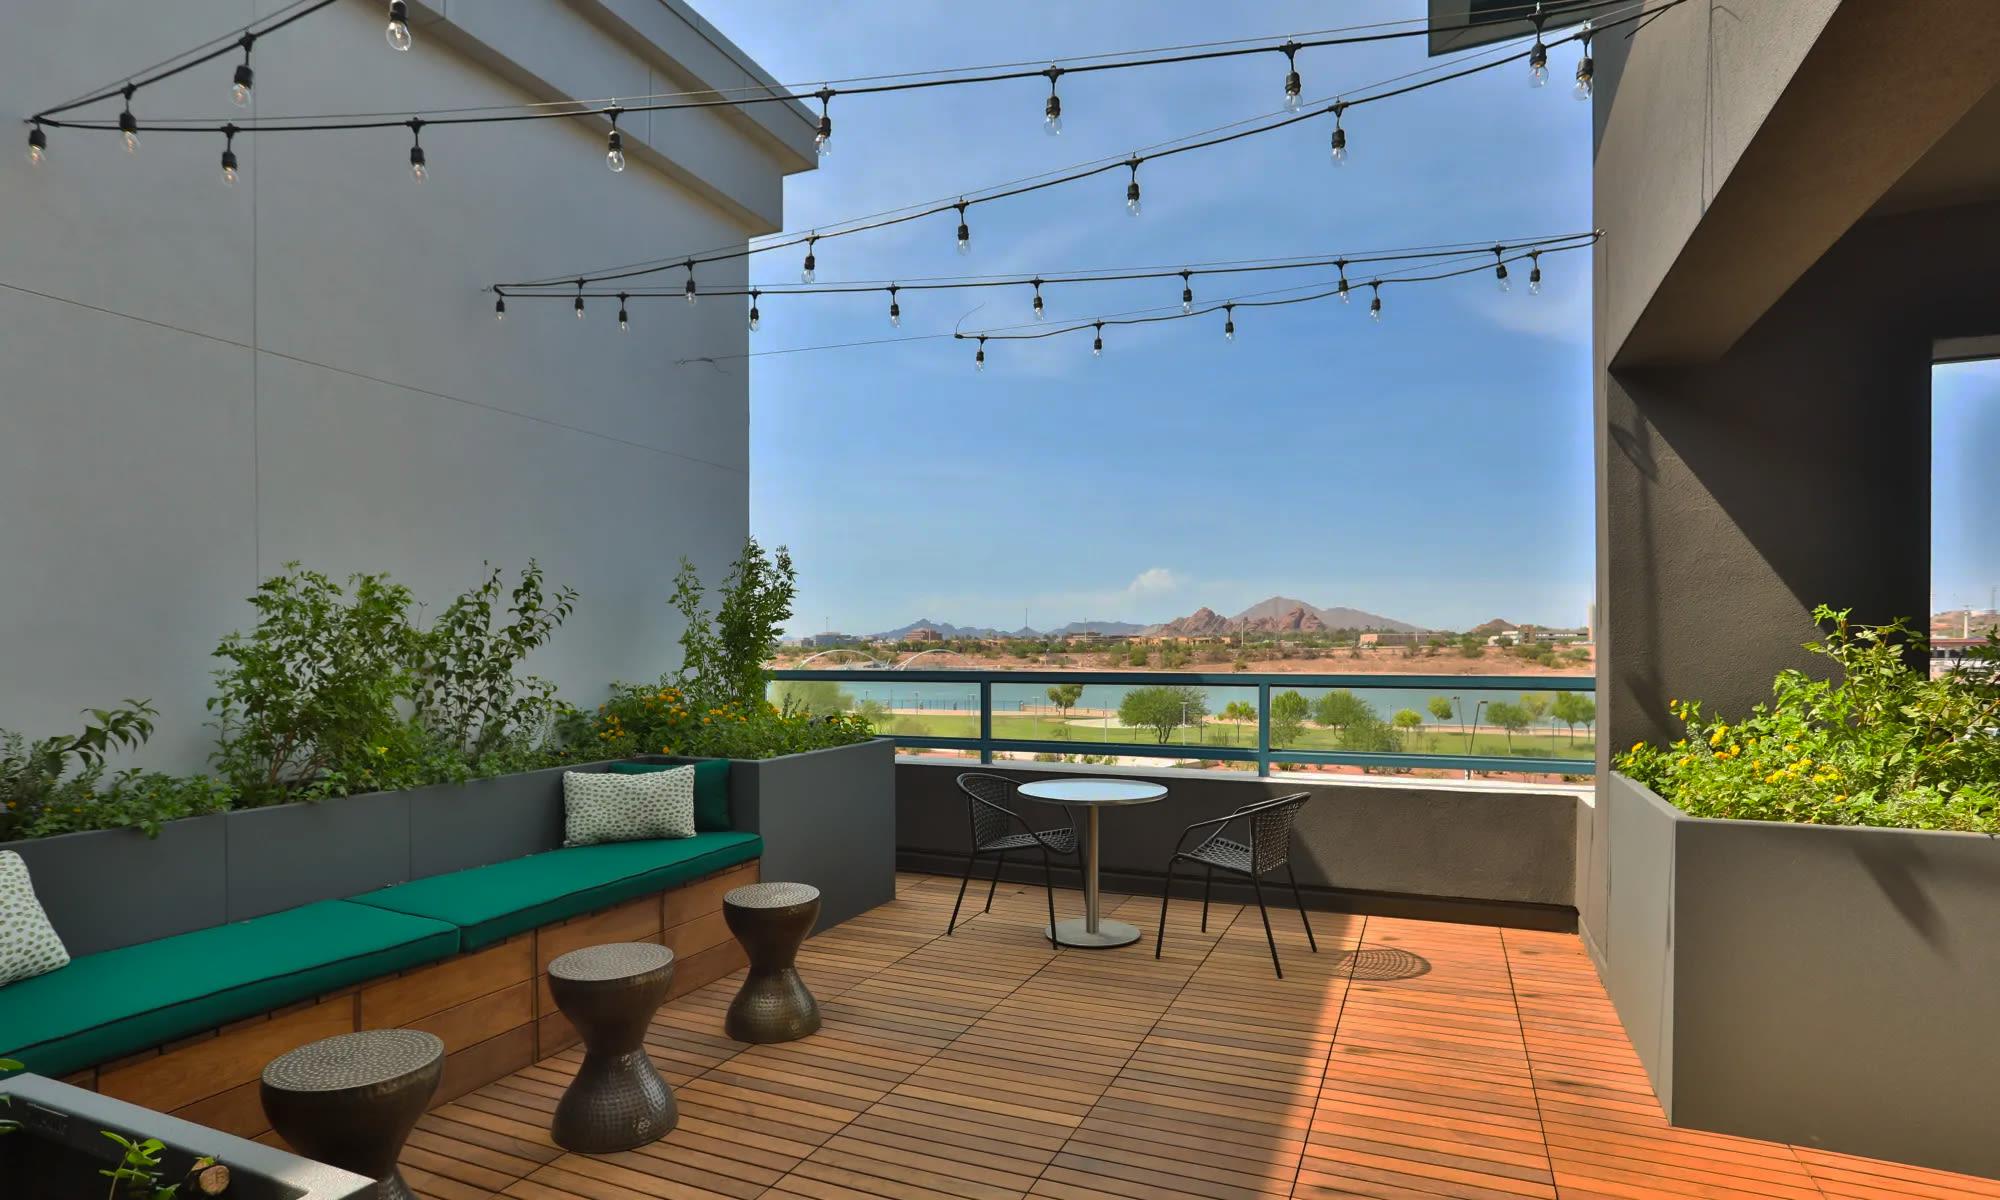 Apartments in Tempe, Arizona, at Lakeside Drive Apartments